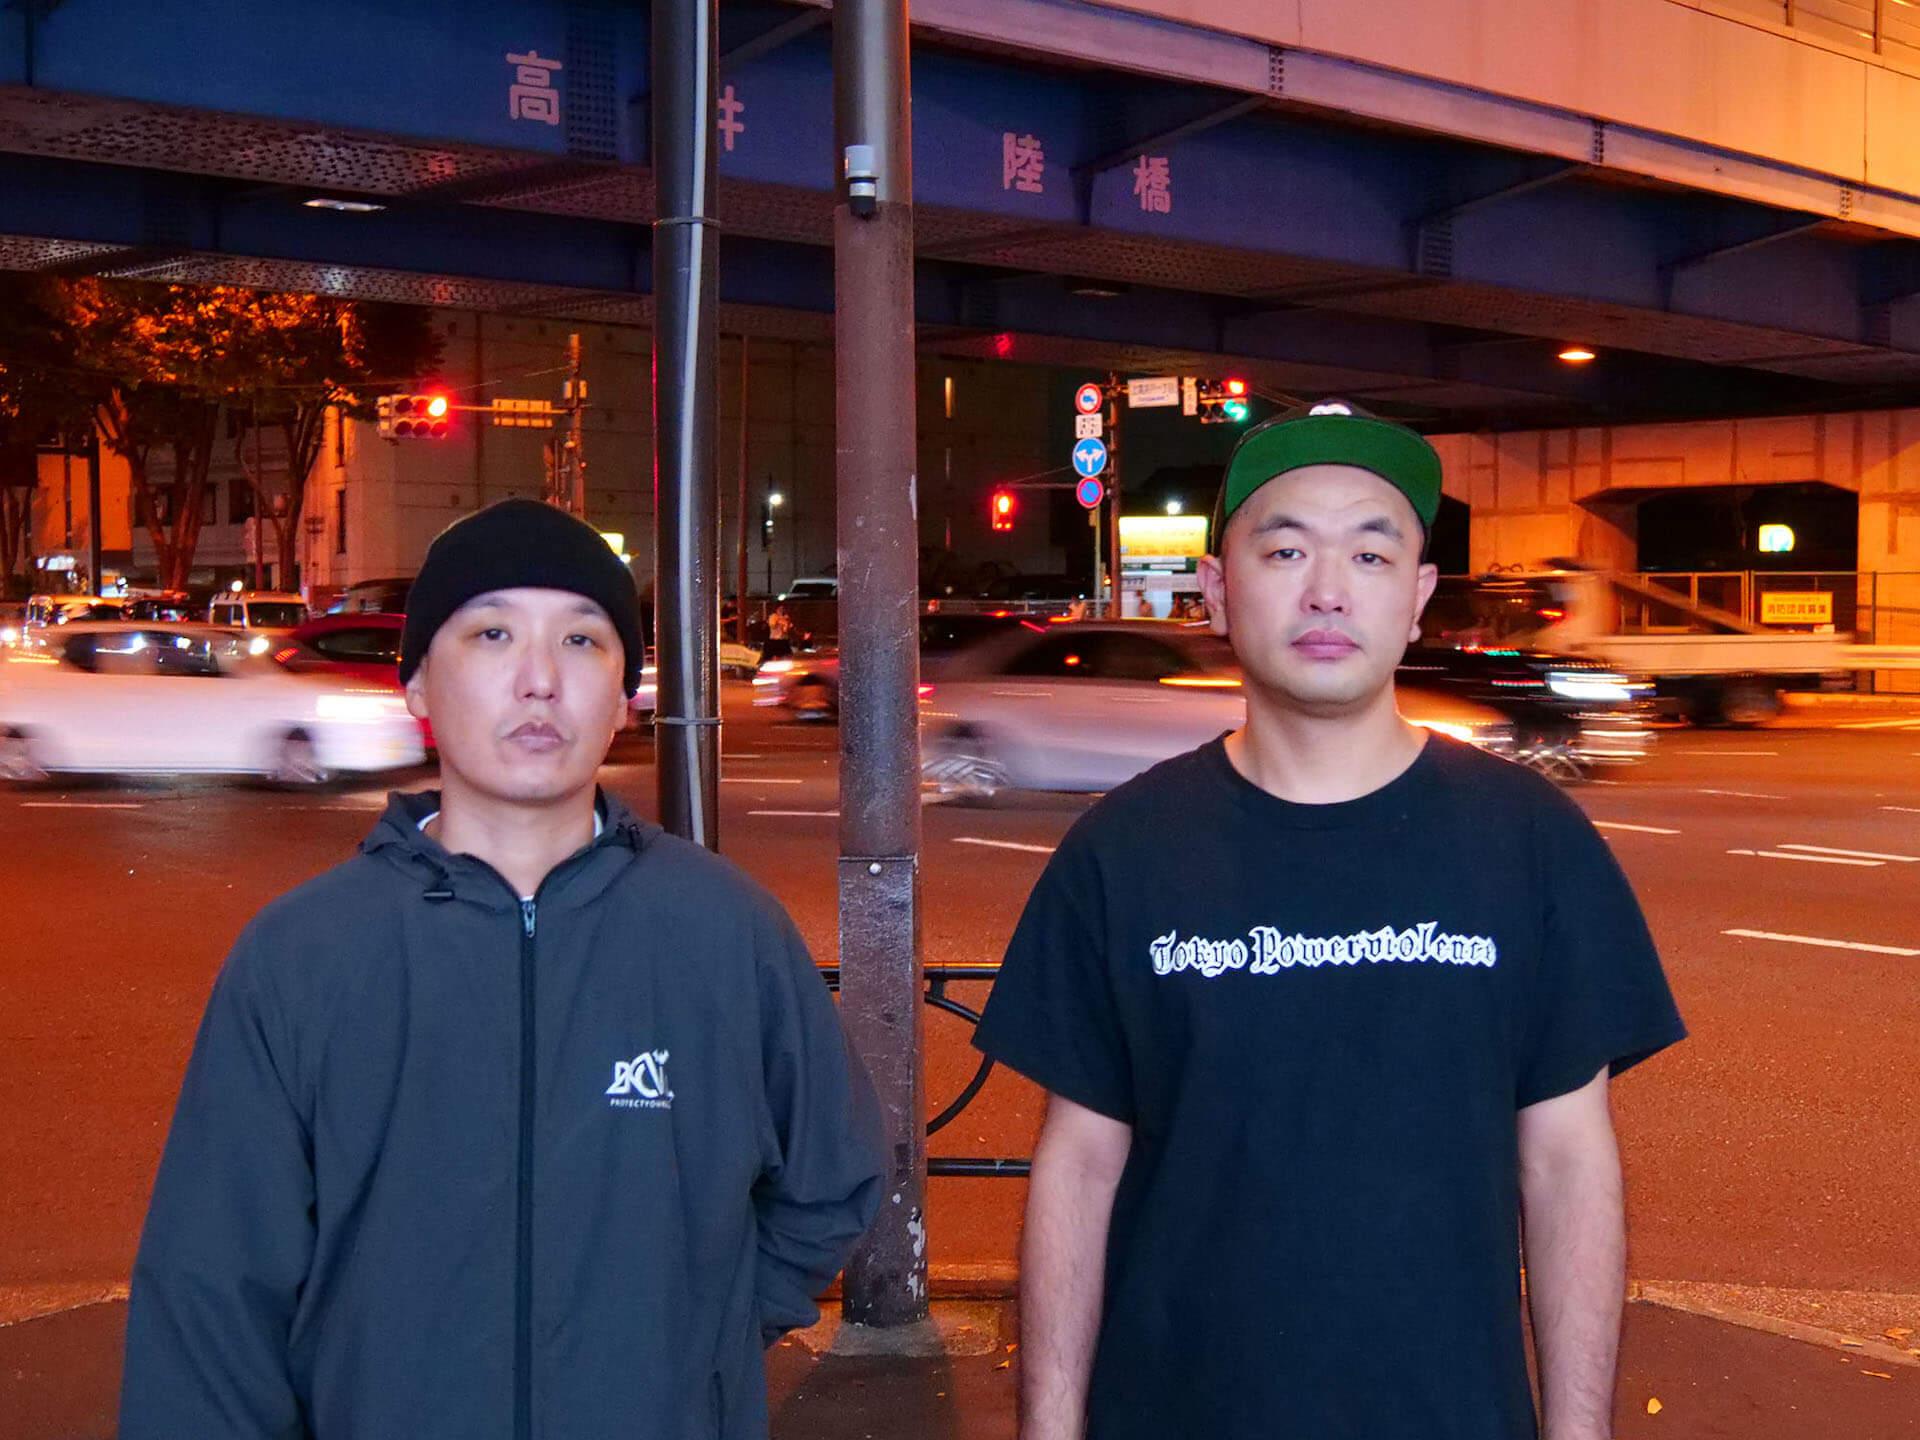 D.U.O TOKYOのERA&DJ HIGHSCHOOLによるシングル『Daily Tales』がリリース決定!客演にはROCKASEN・TONAN、OS3が参加 3a390fa29b6017fe43974ac22cdb8e55